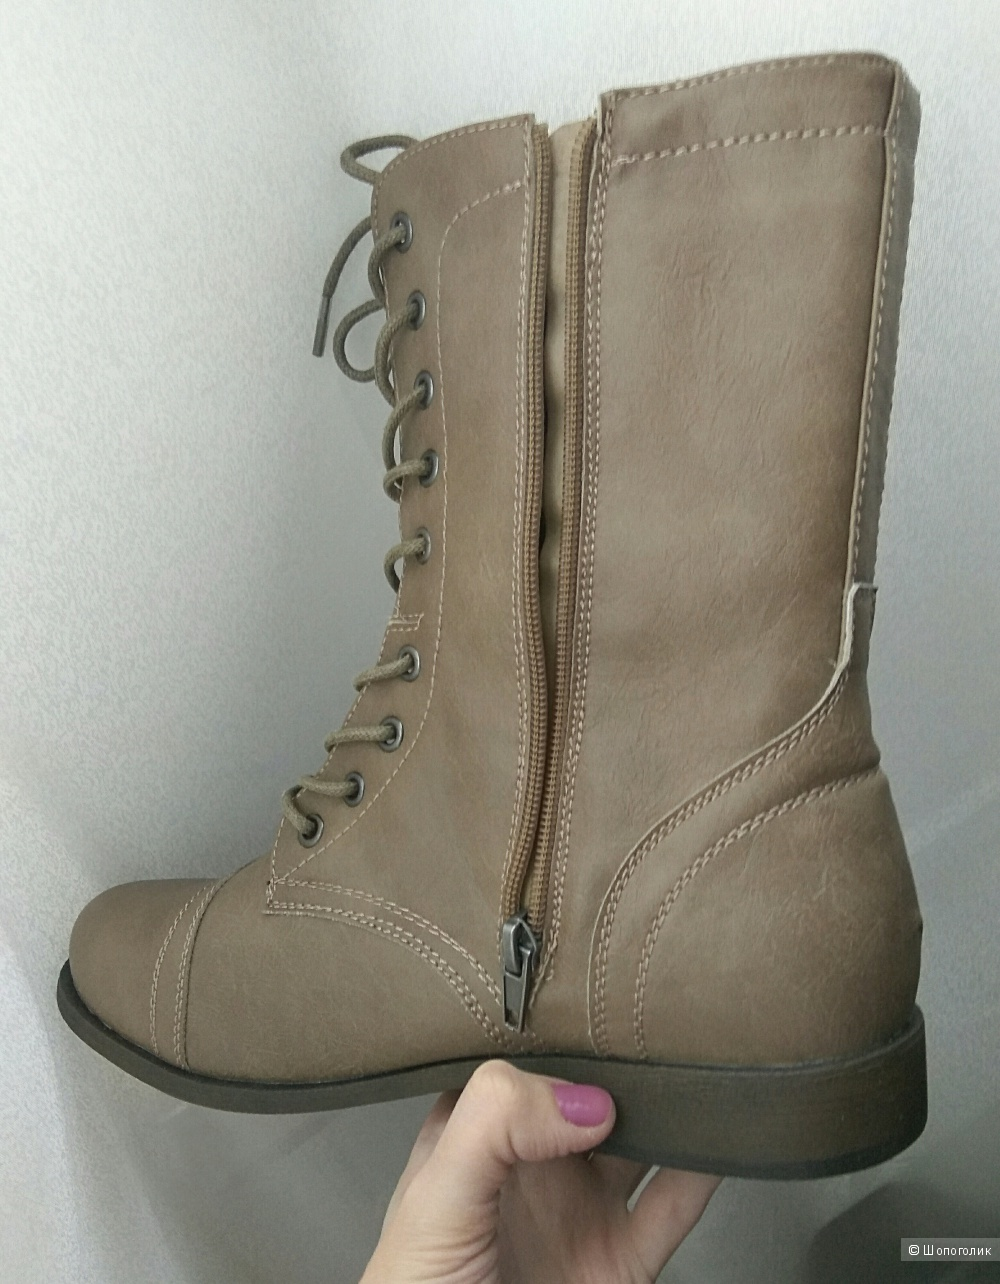 Ботинки Madden girl Gomby, размер 8,5